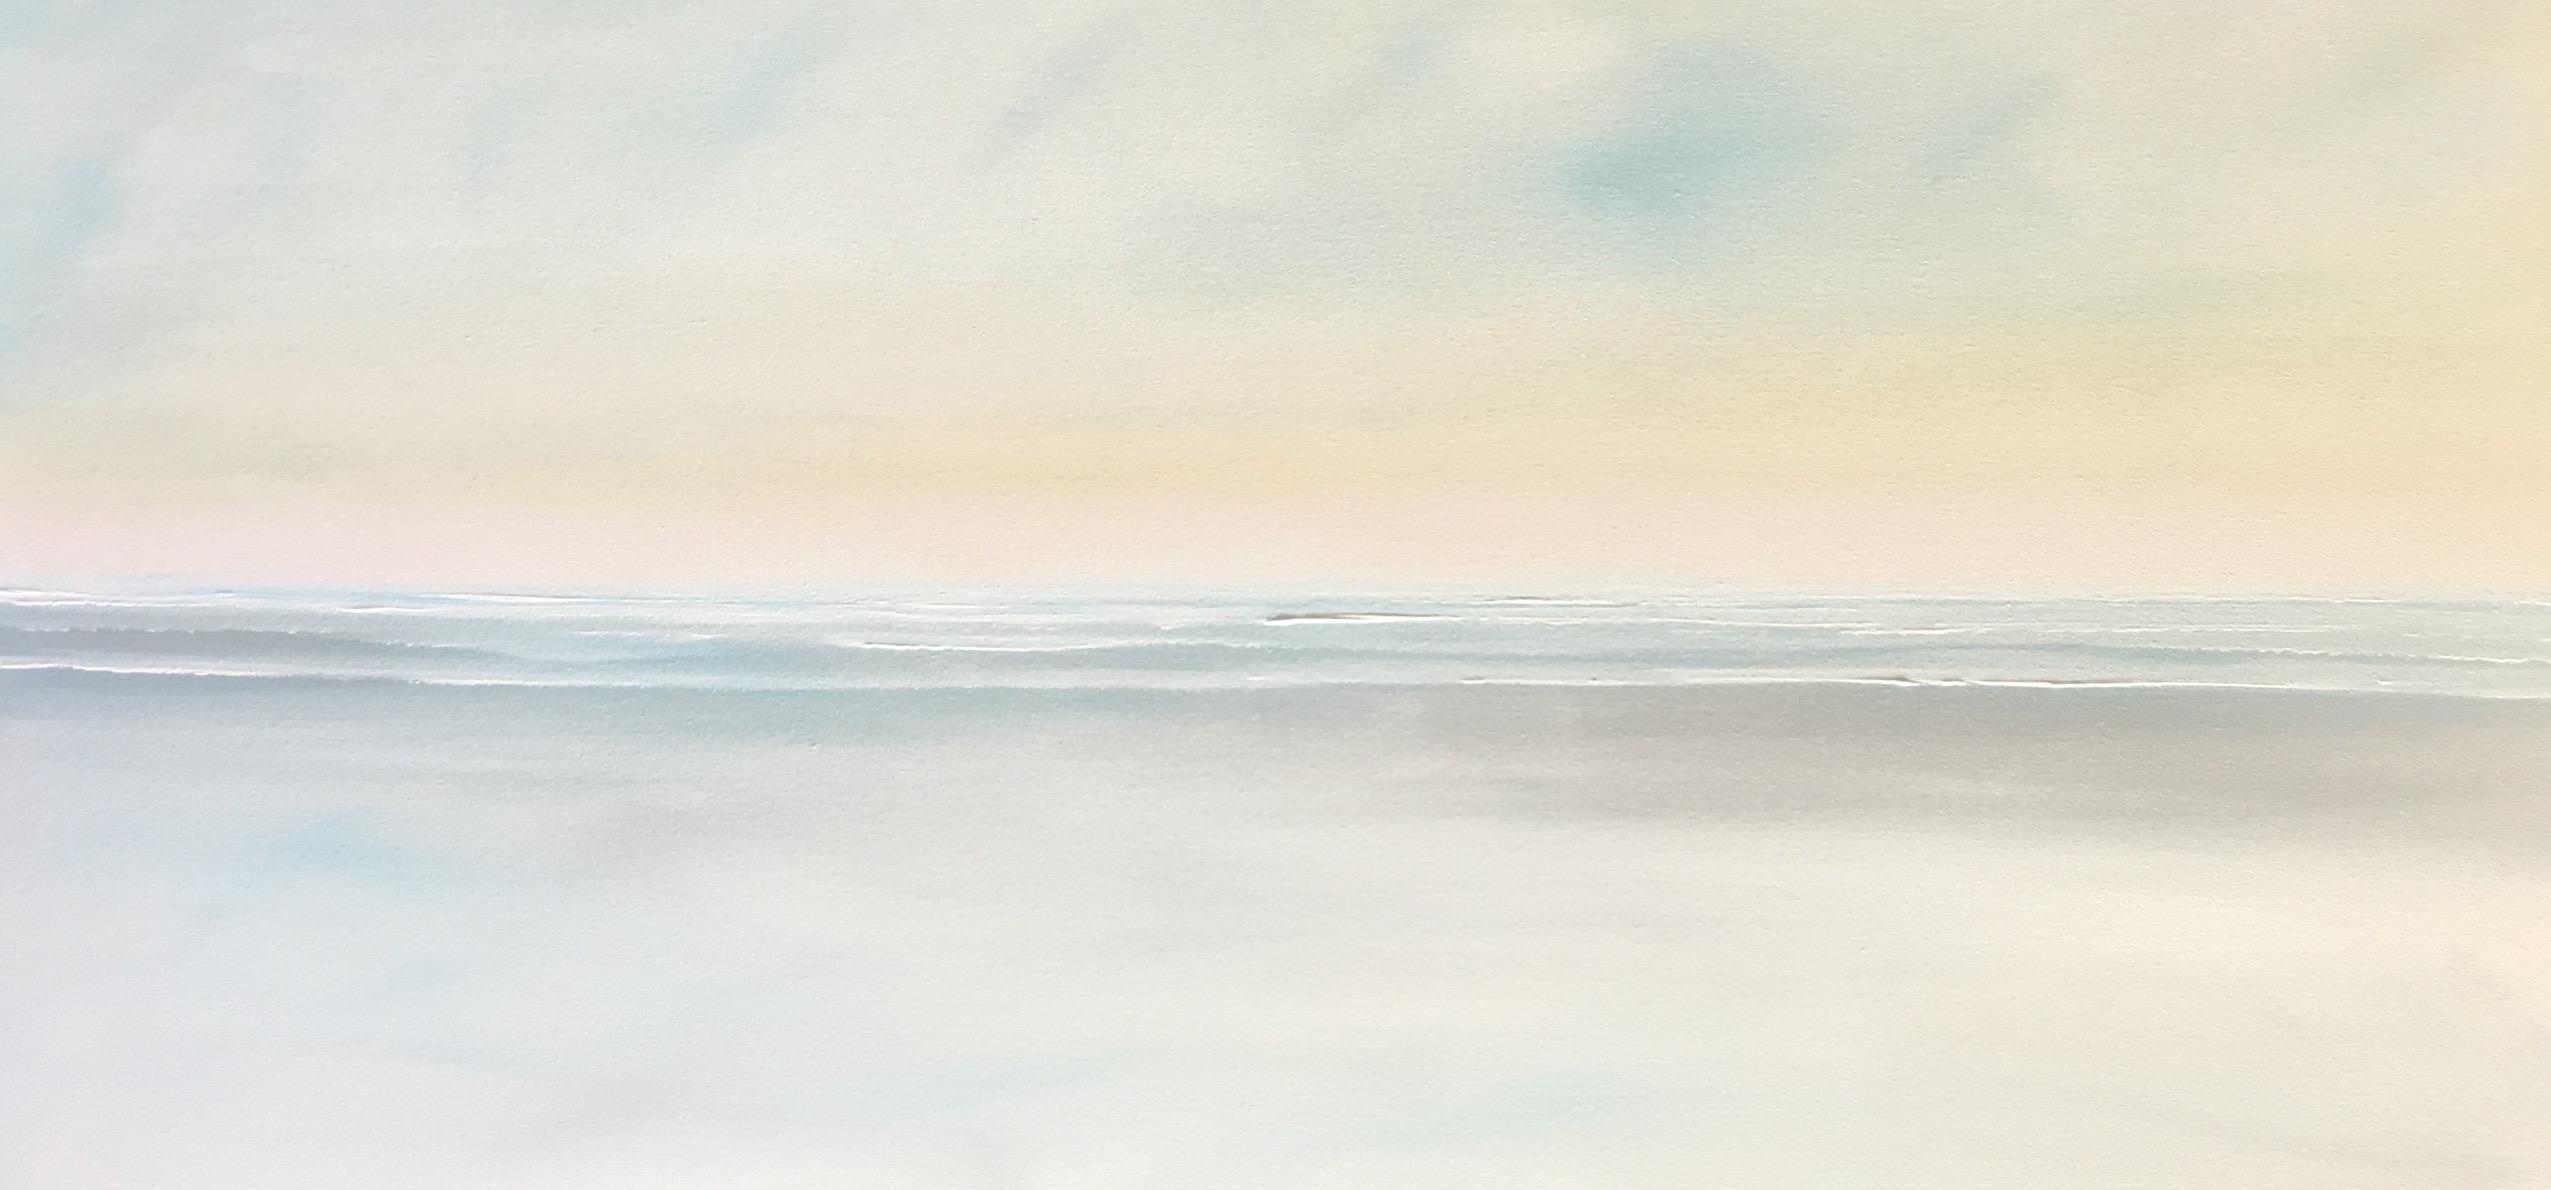 Beautiful coastal paintings by Becky O'Toole #interview #creativity #coastal #seascapes